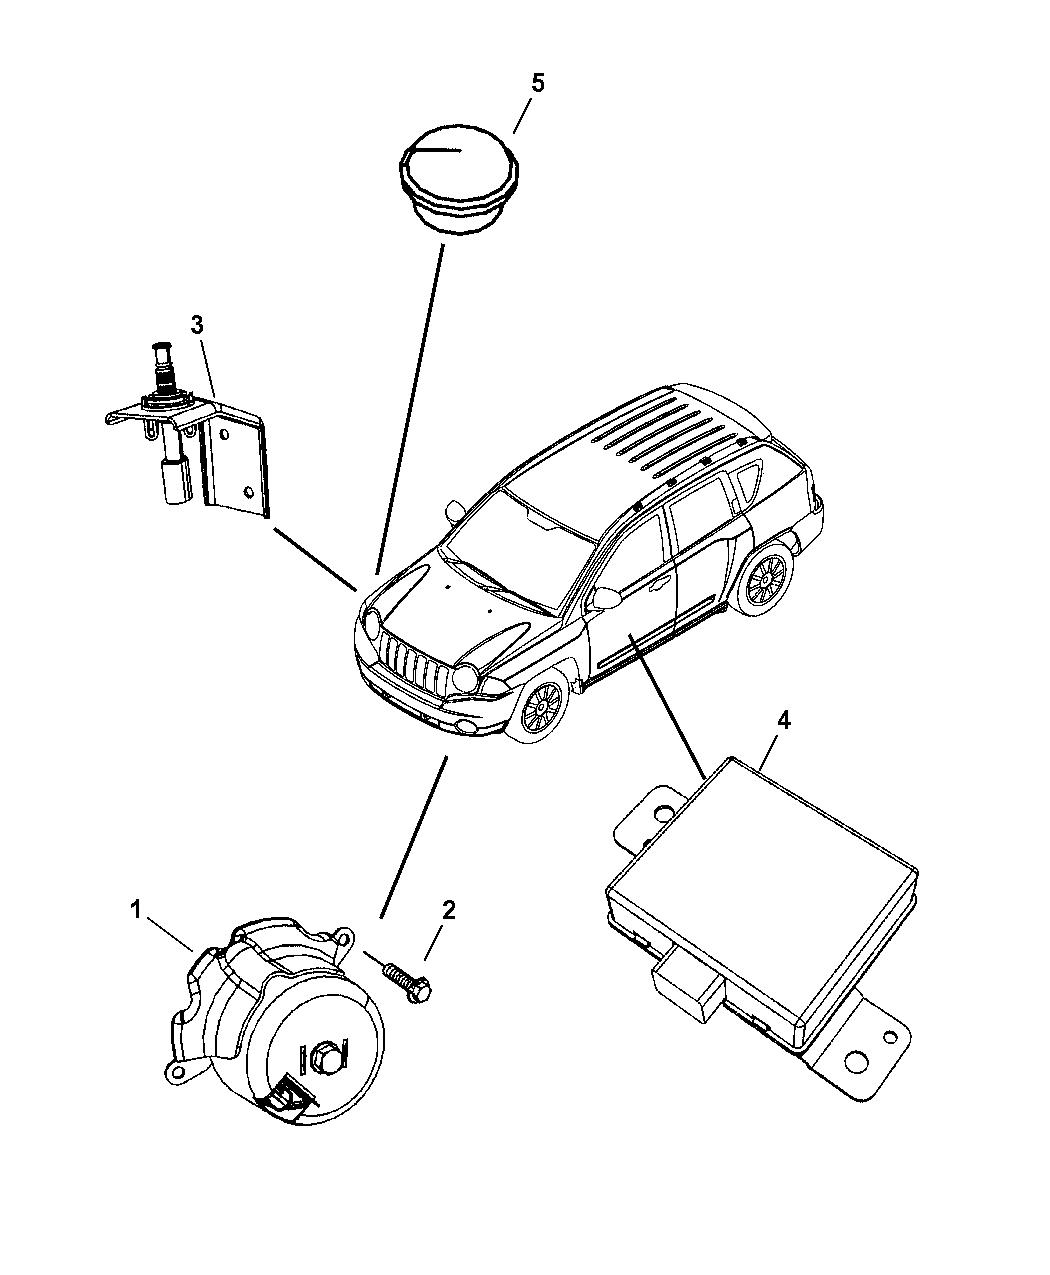 jeep patriot alarm system